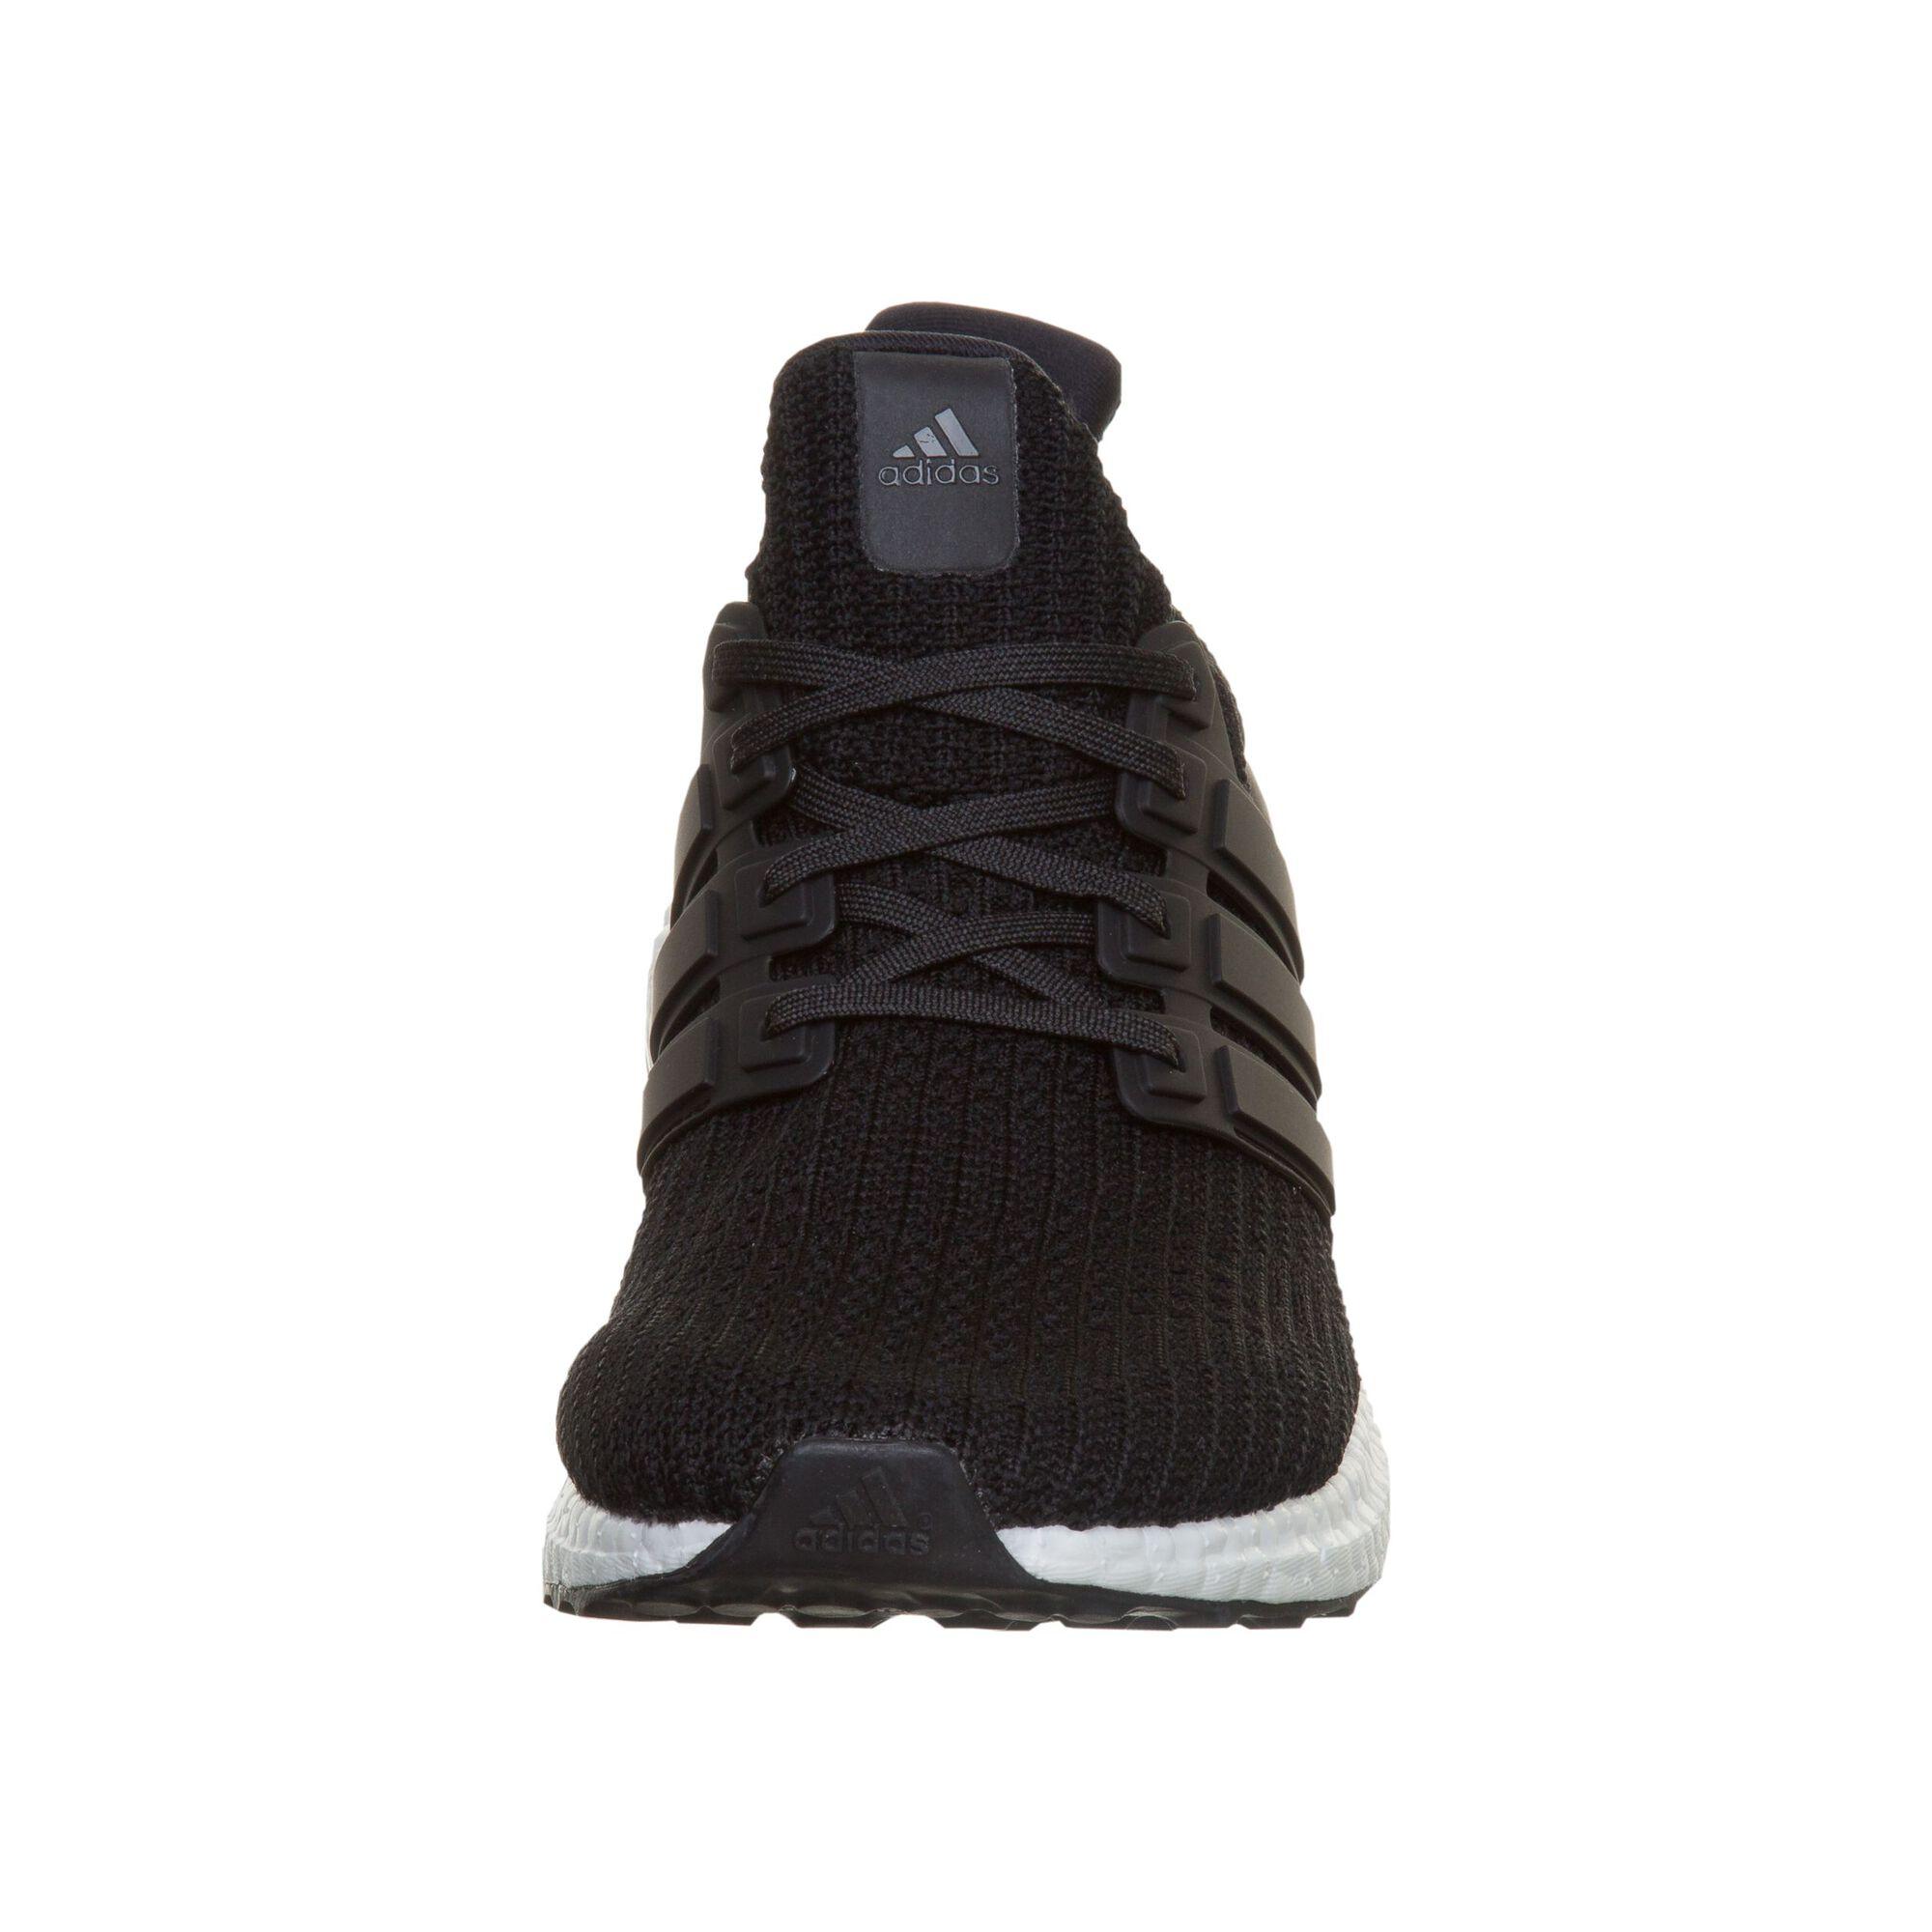 premium selection b927e d6c5c ... adidas adidas adidas adidas. Ultra Boost ...